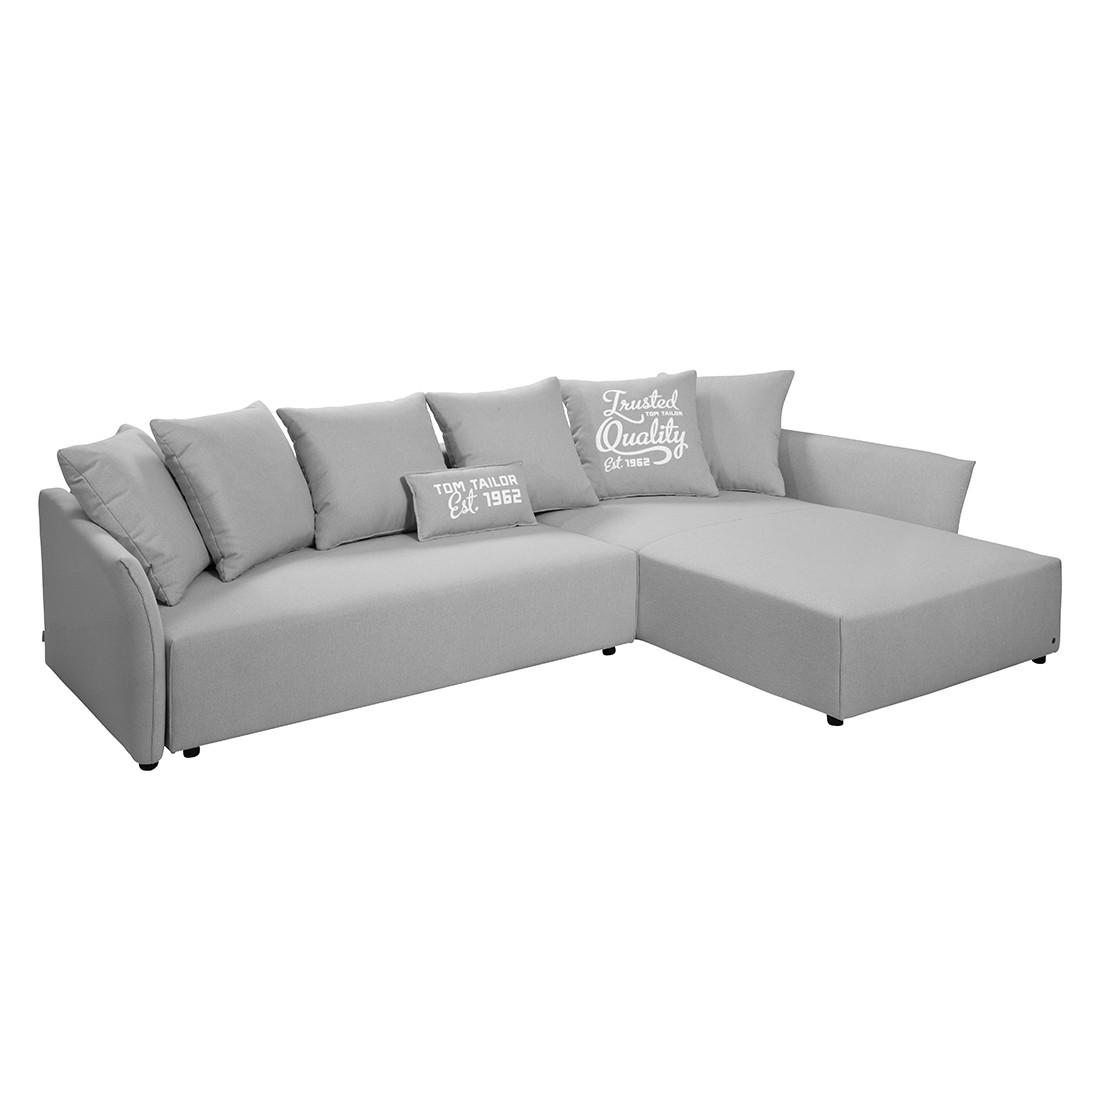 ecksofa wings casual mit schlaffunktion strukturstoff longchair ottomane davorstehend. Black Bedroom Furniture Sets. Home Design Ideas